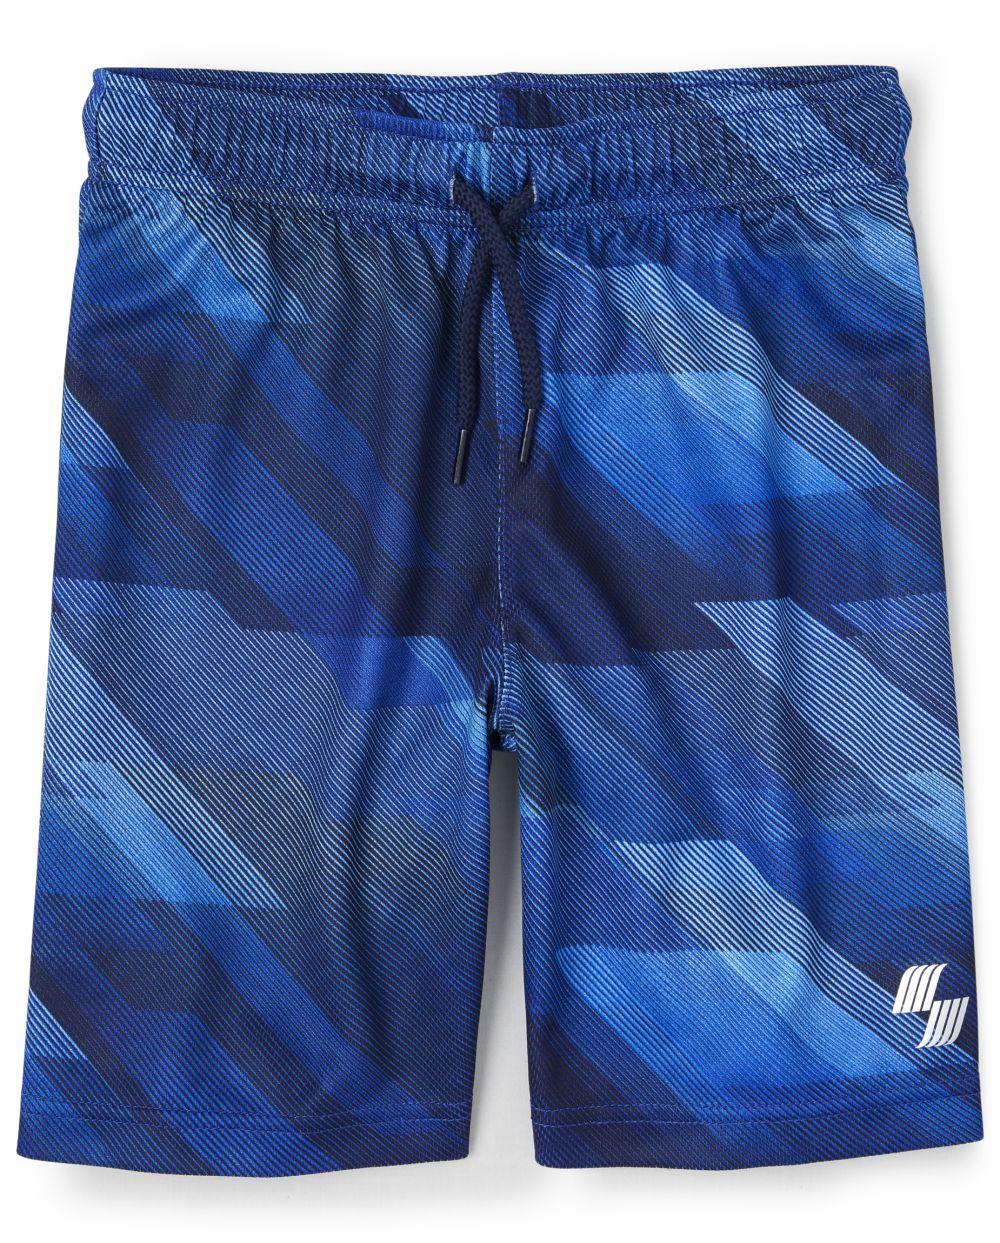 Boys Mix And Match Mesh Performance Basketball Shorts